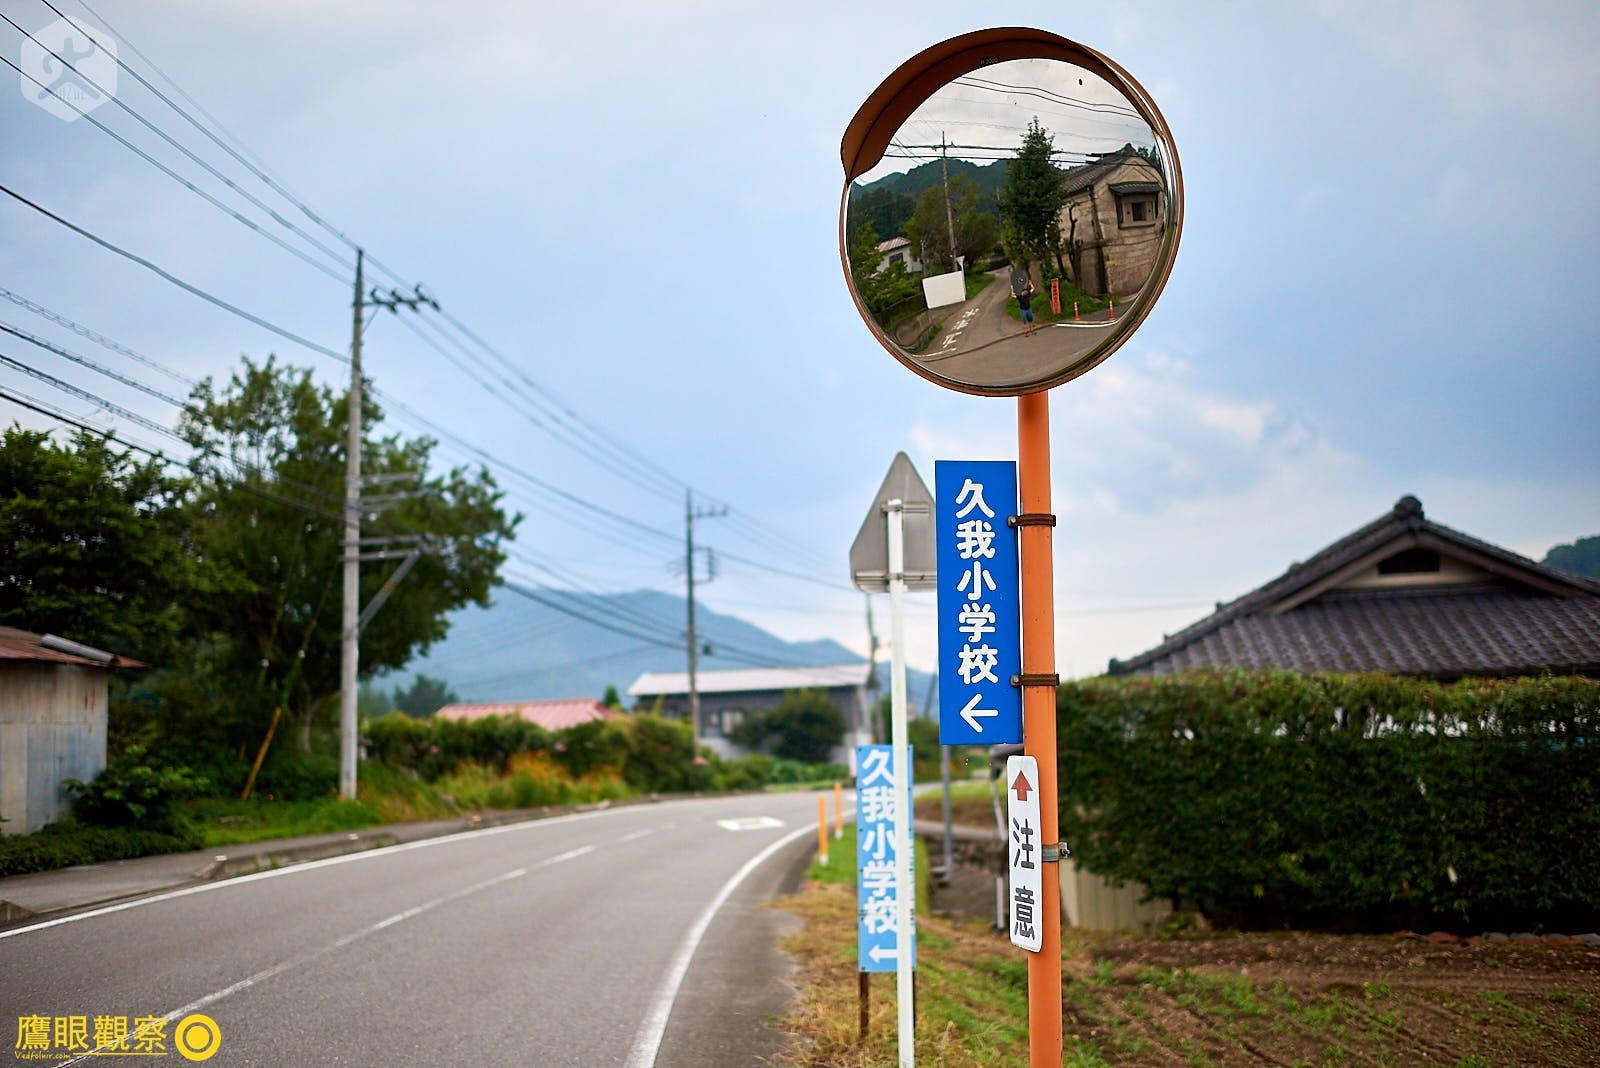 Japan Travel RV Camper School 20190817160318 日本廢棄小學 🚗 RV 休旅車露營、森林探險之旅(櫪木縣鹿沼市立久我小學)🇯🇵⛺️